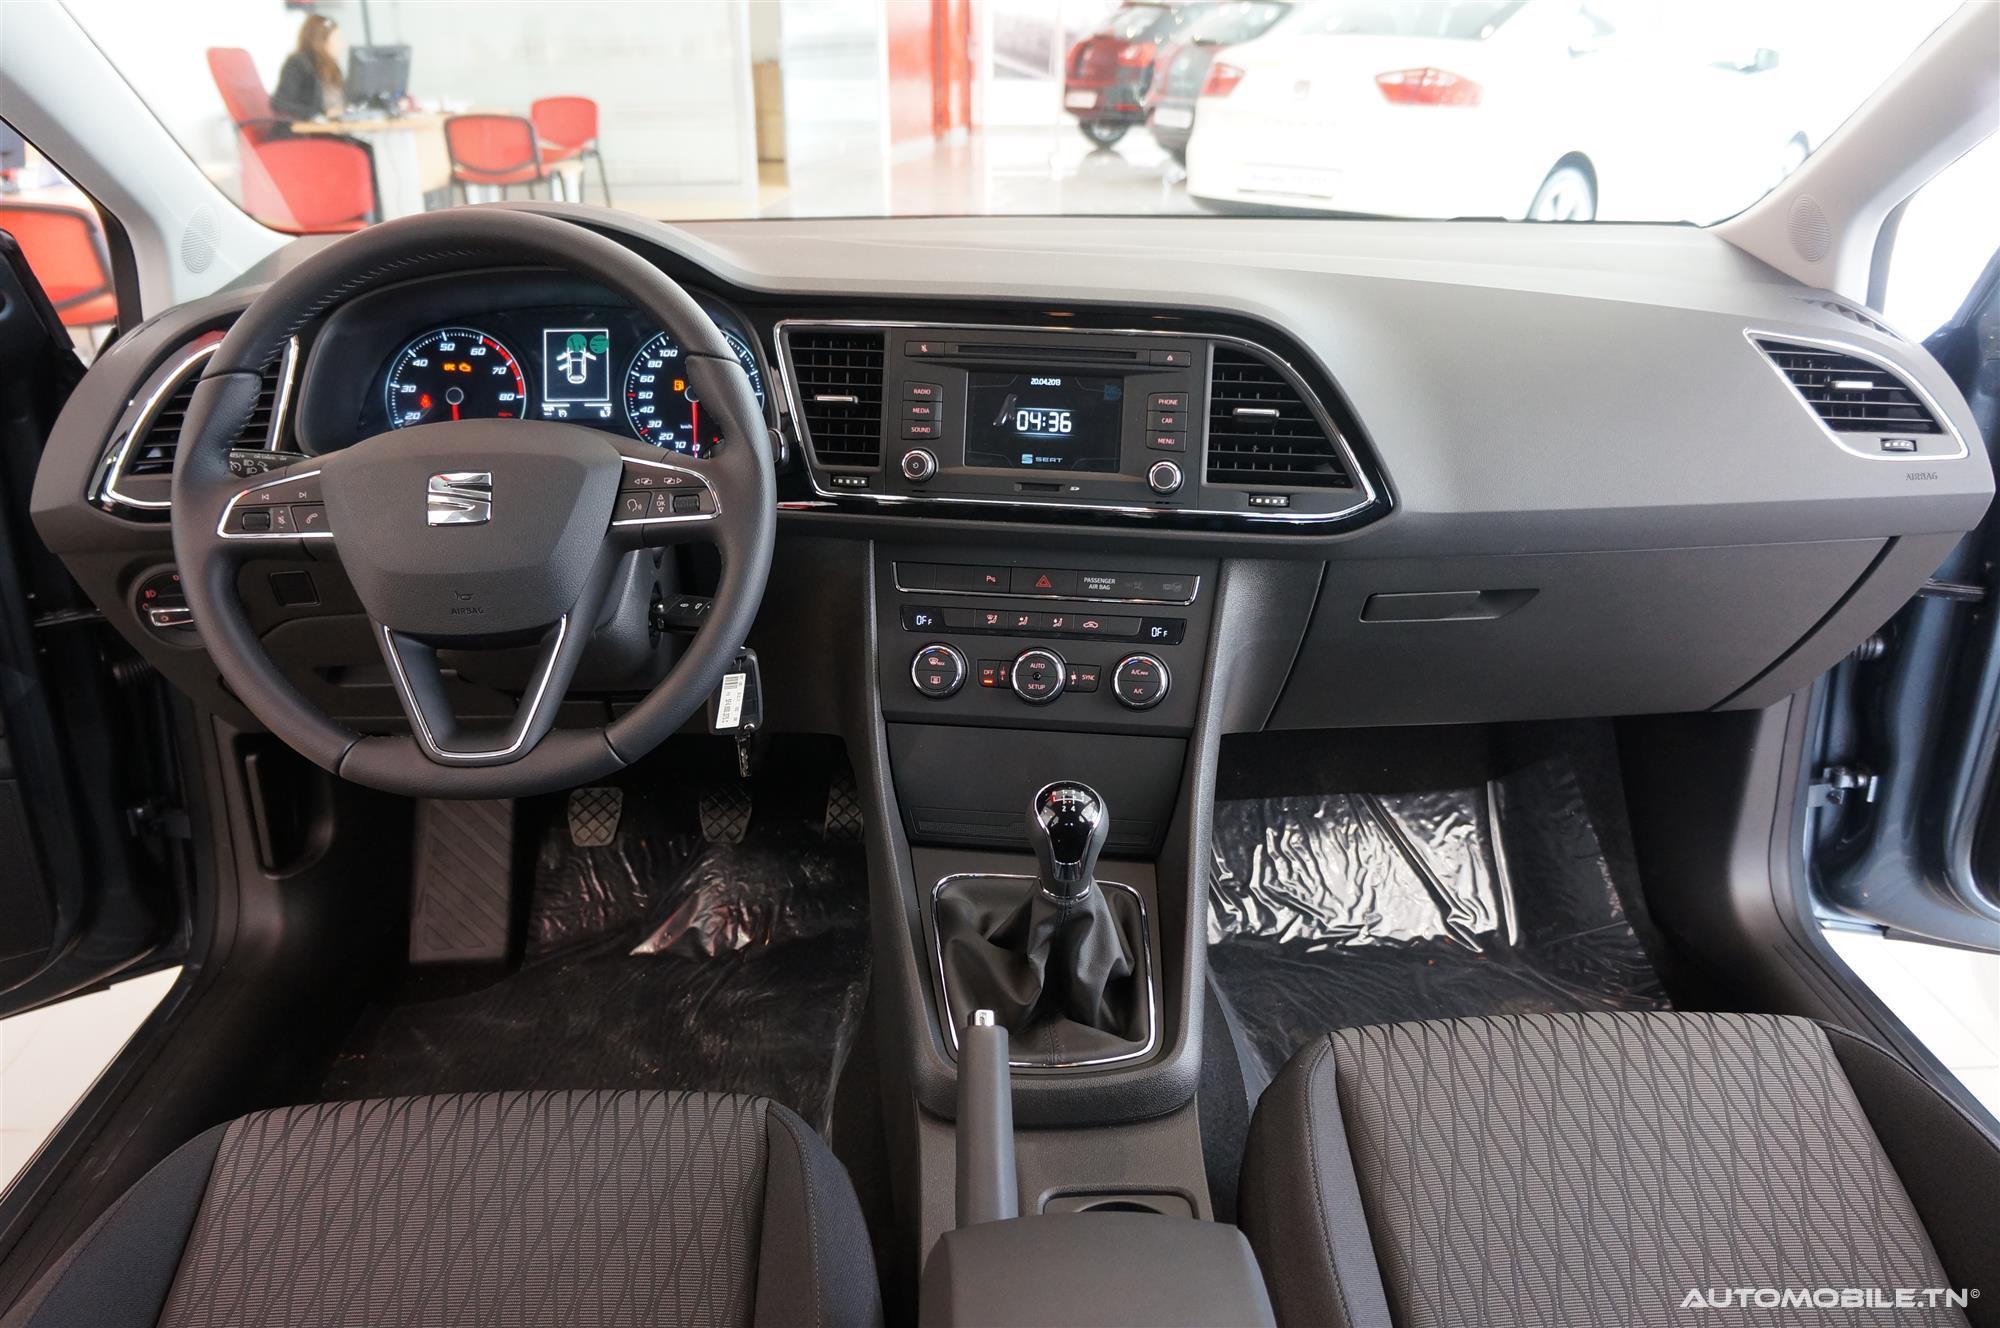 https://galerie.automobile.tn/max/2013/07/seat-leon-style-ennakl-10823.JPG